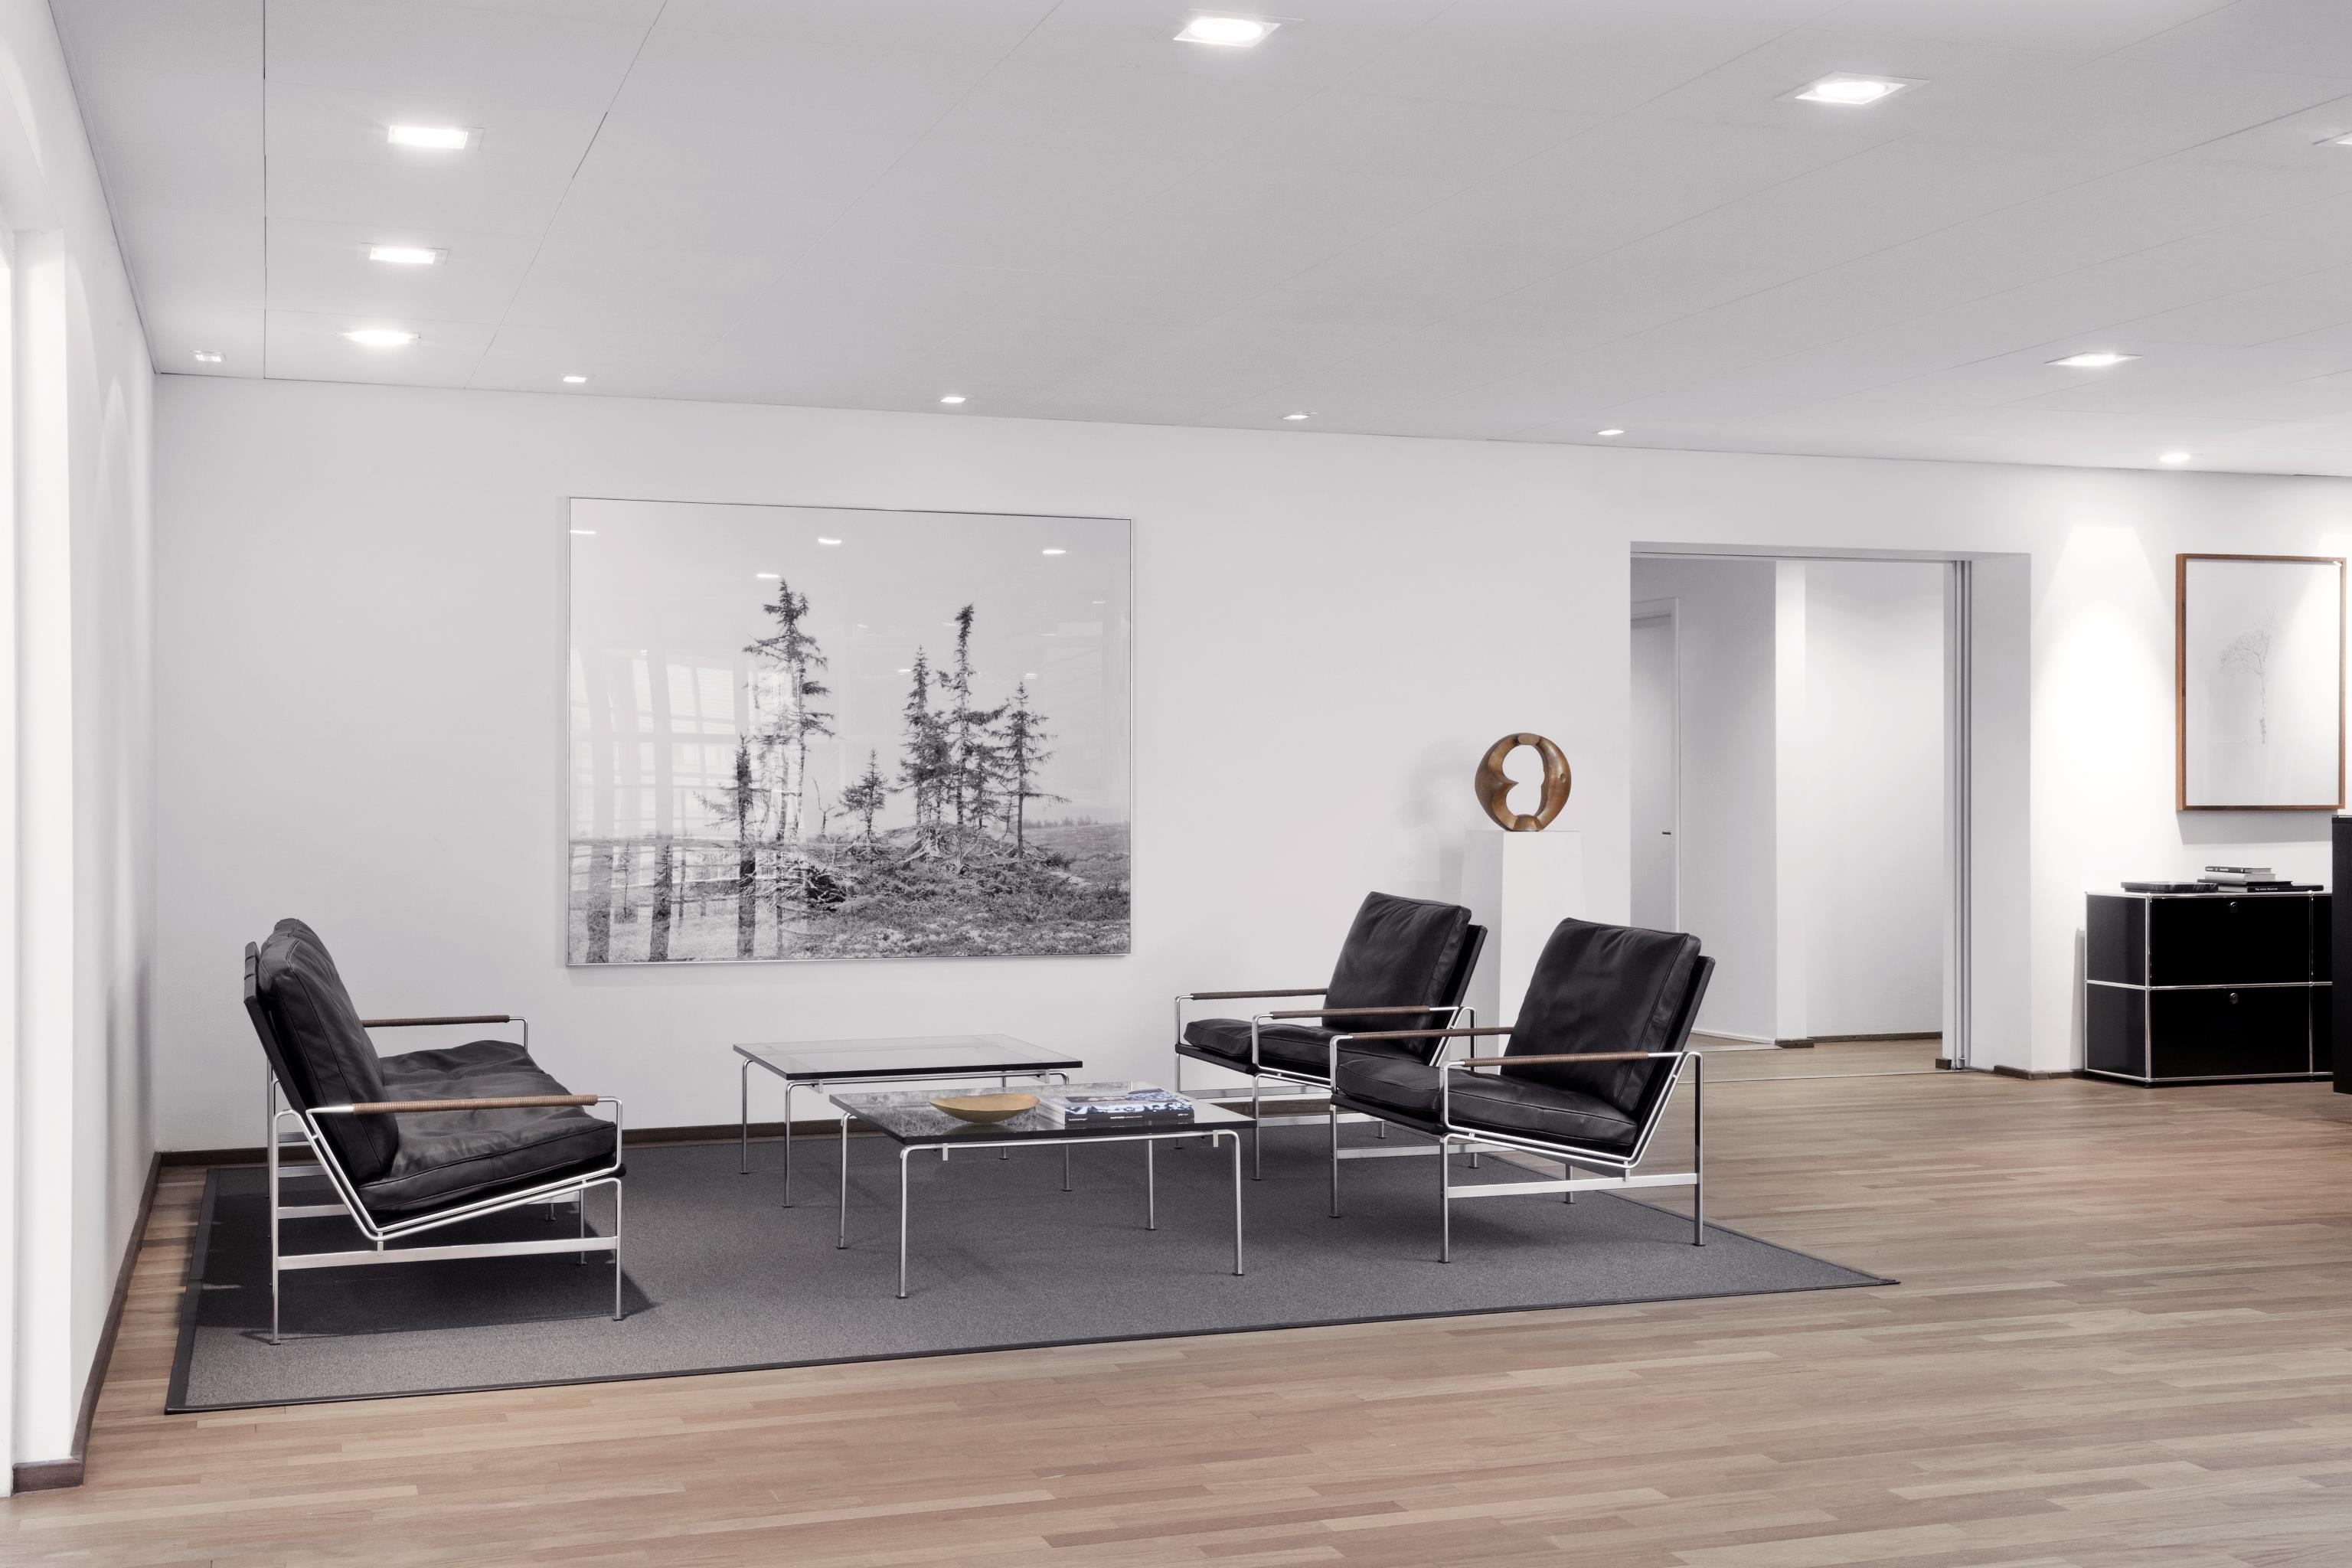 03_6461_kontorhotel-brink-serviced-office_lounge2